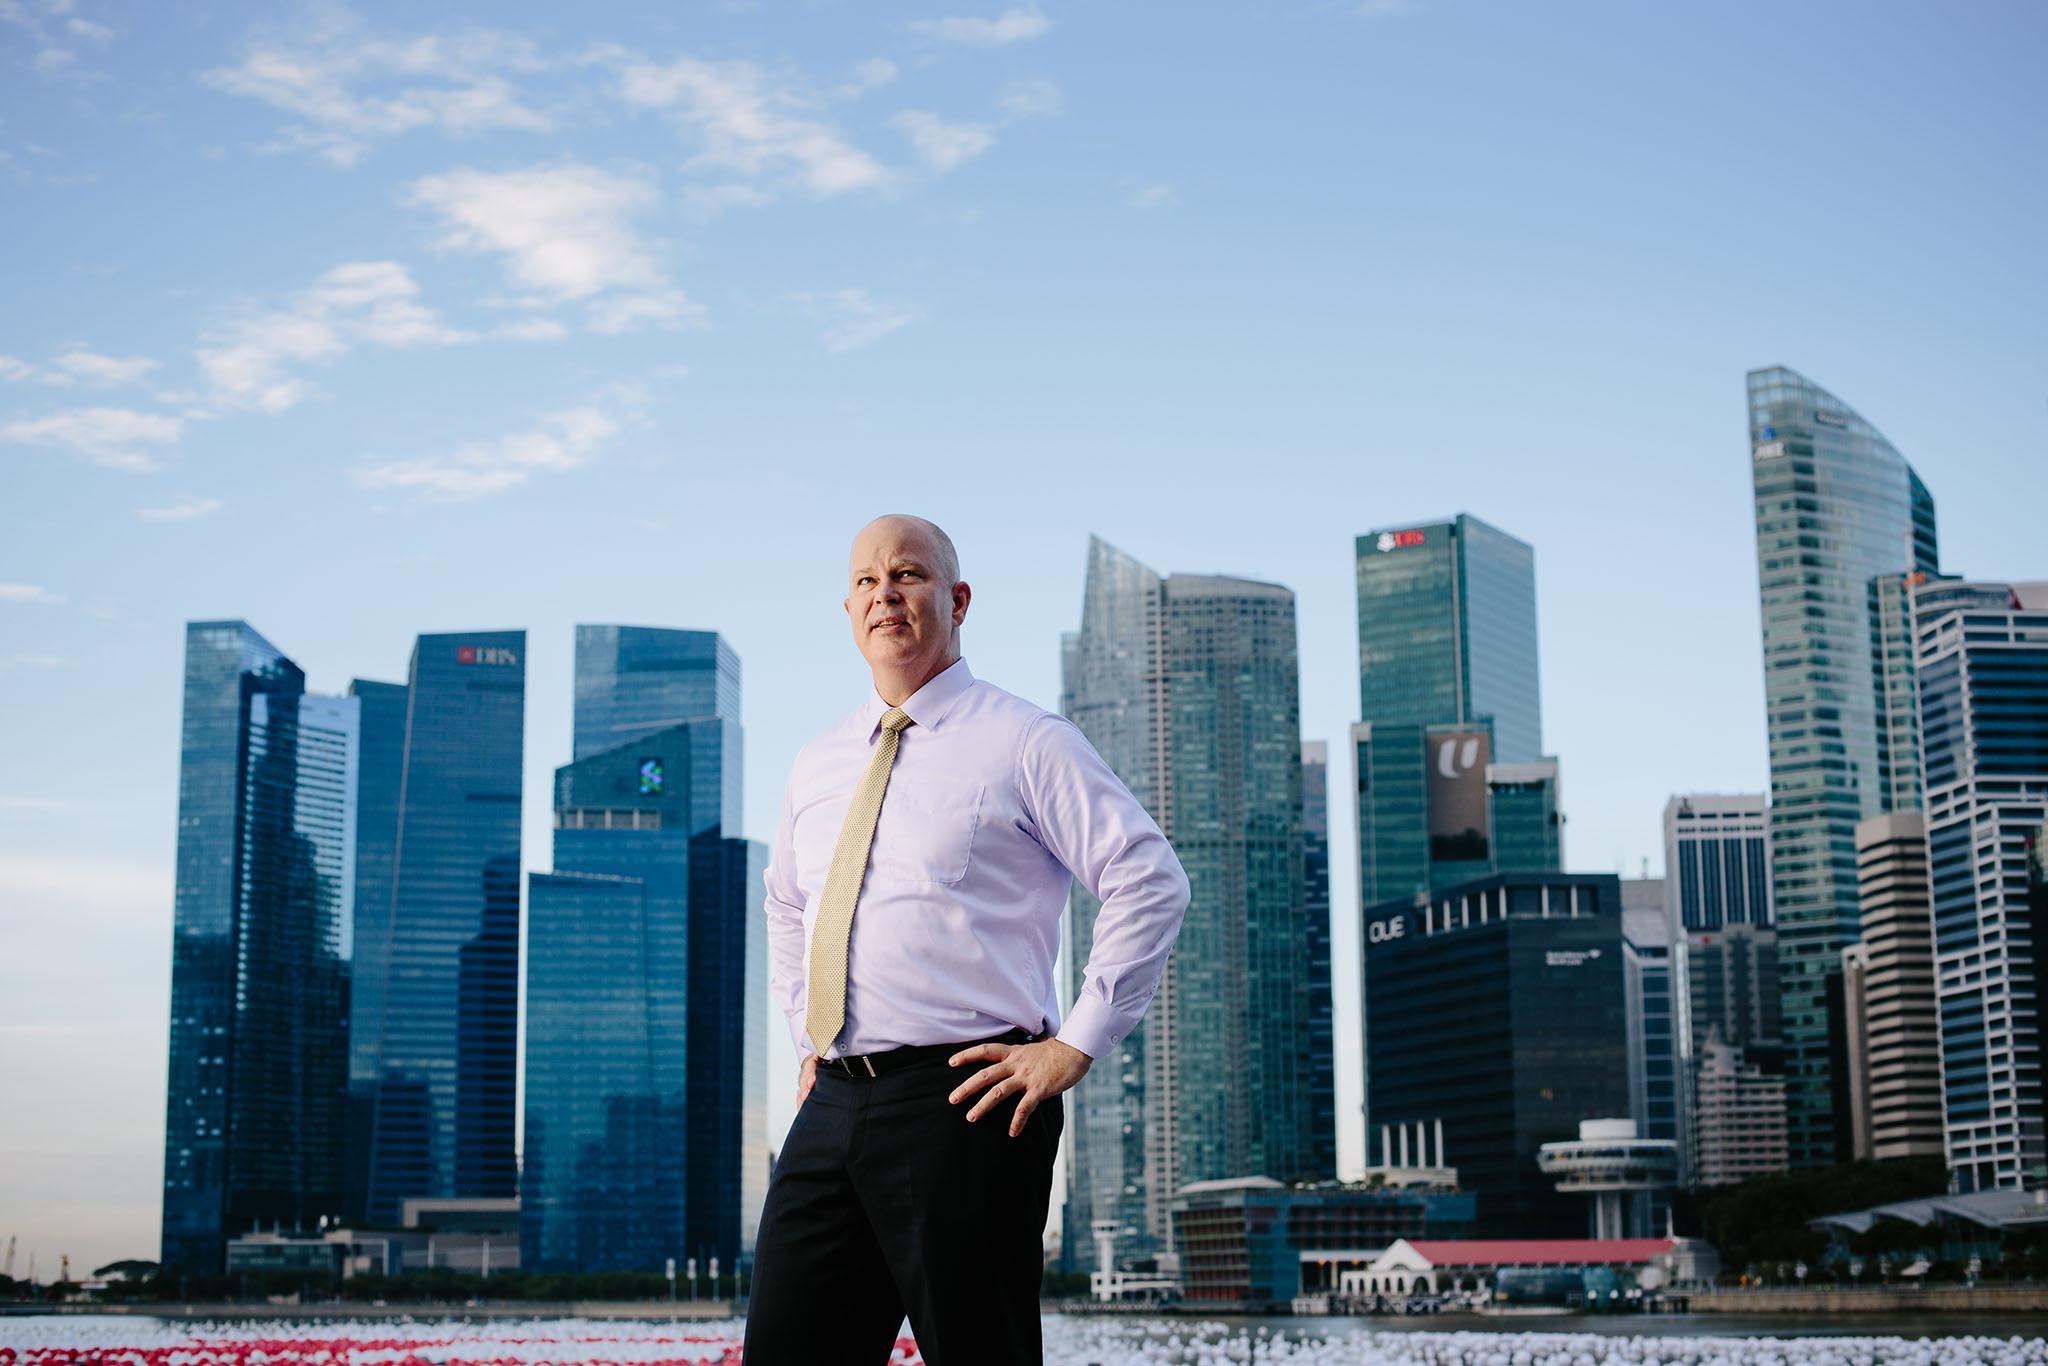 singapore-commercial-editorial-photographer-portraiture-intouch-matthew-foley-zakaria-zainal-01.jpg